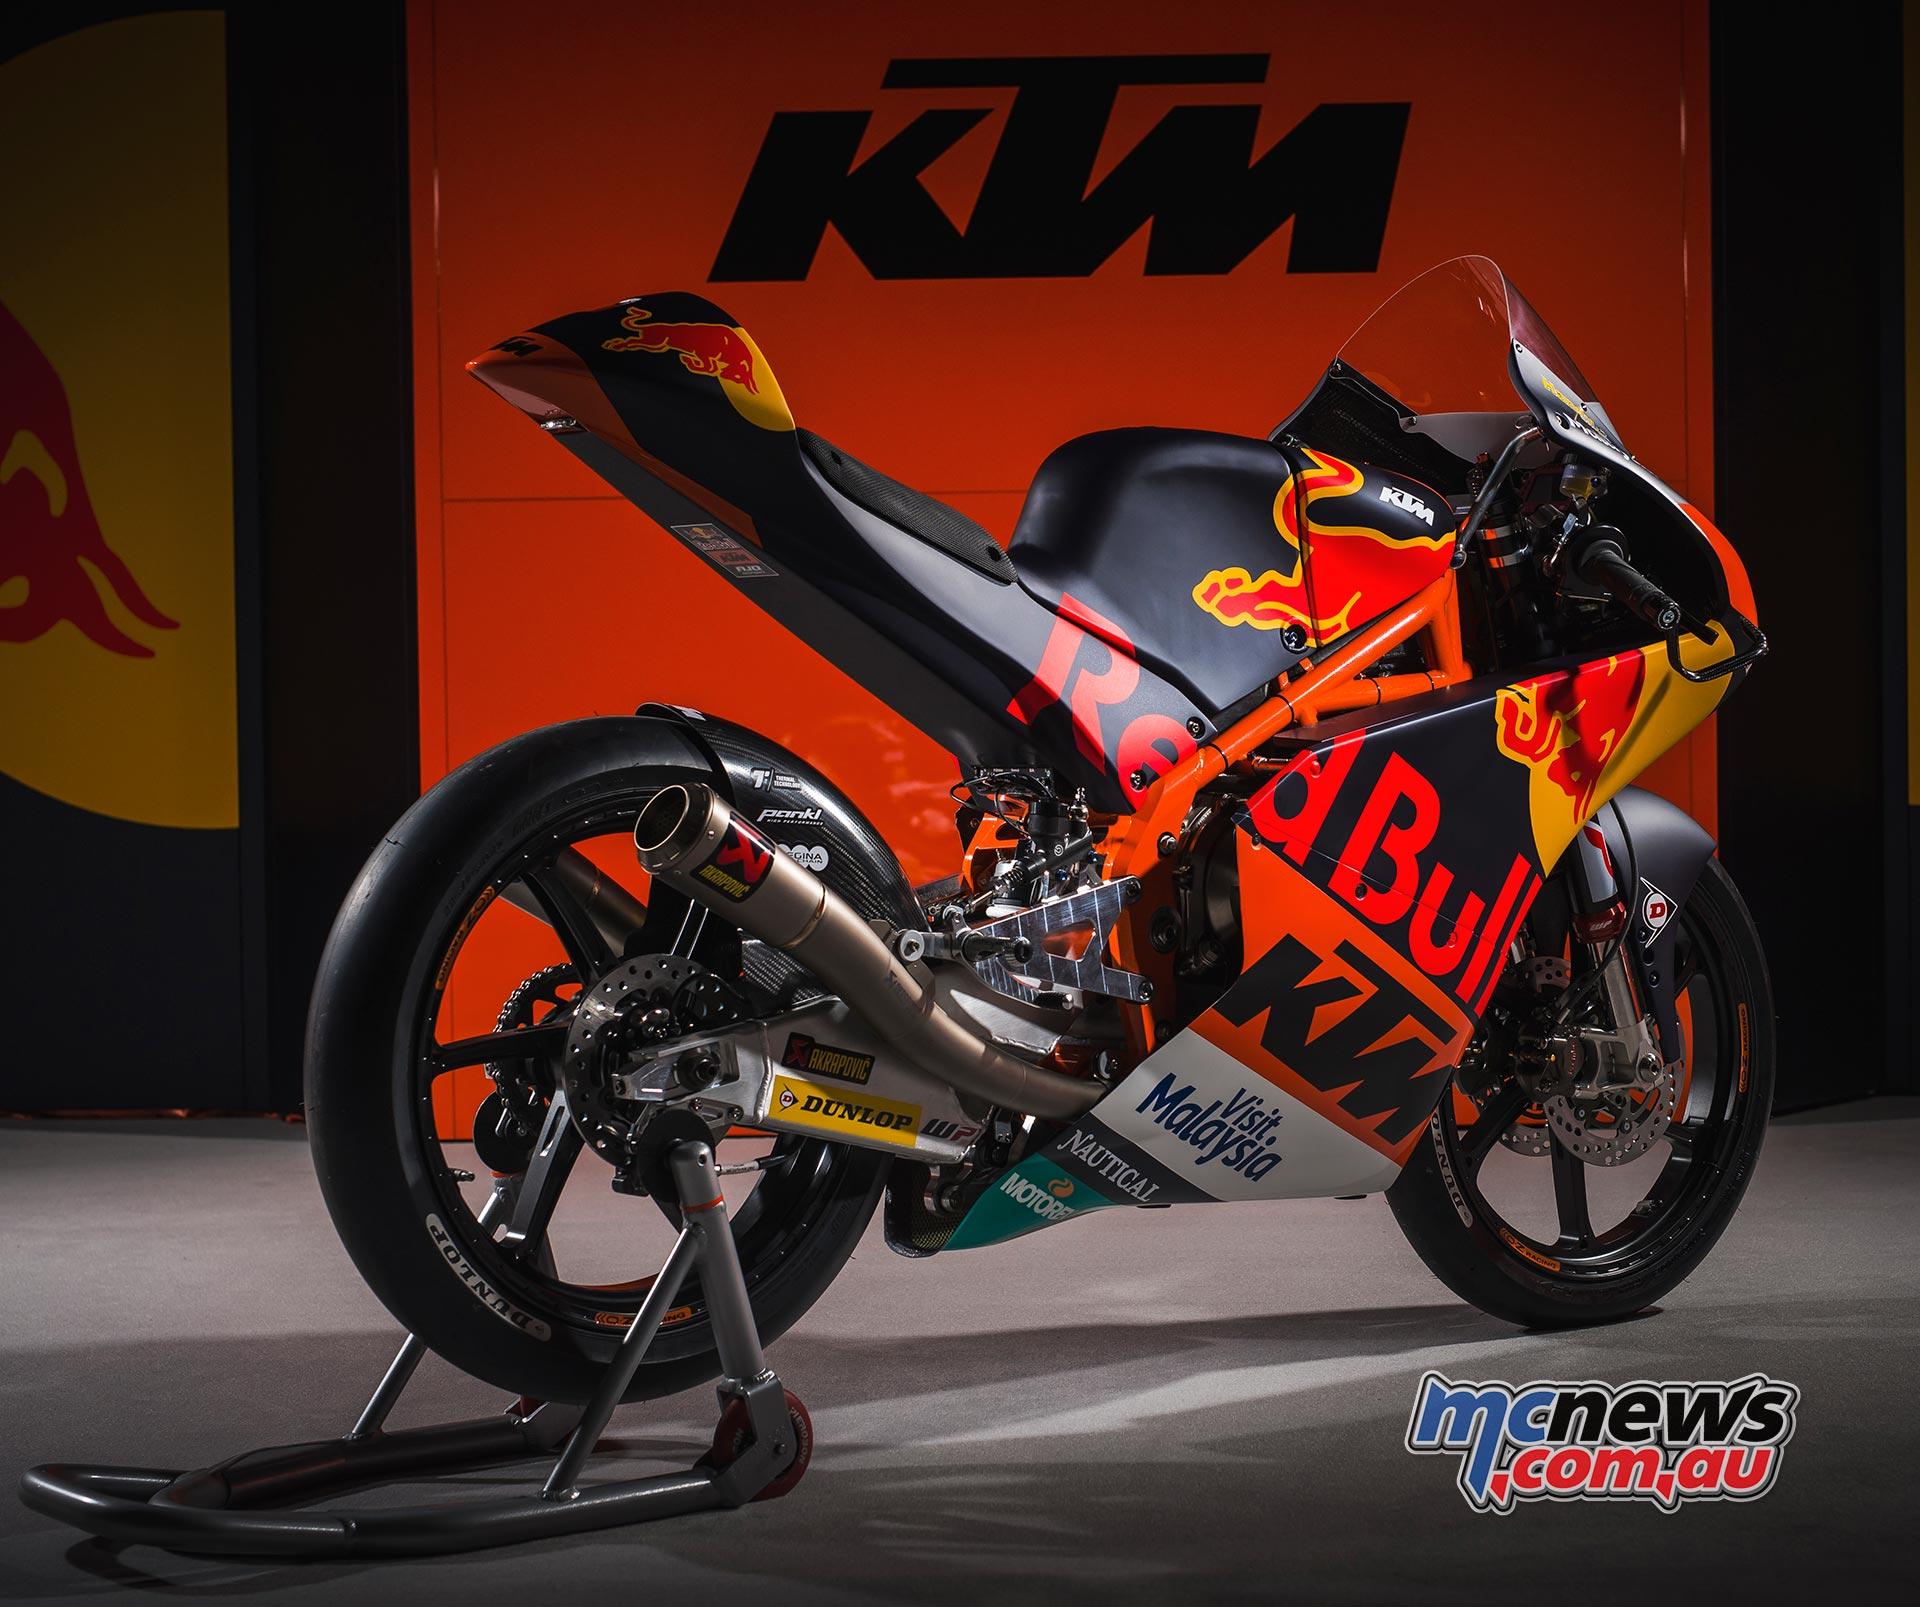 KTM Team Launch MotoGP | Moto2 | Moto3 | MCNews.com.au